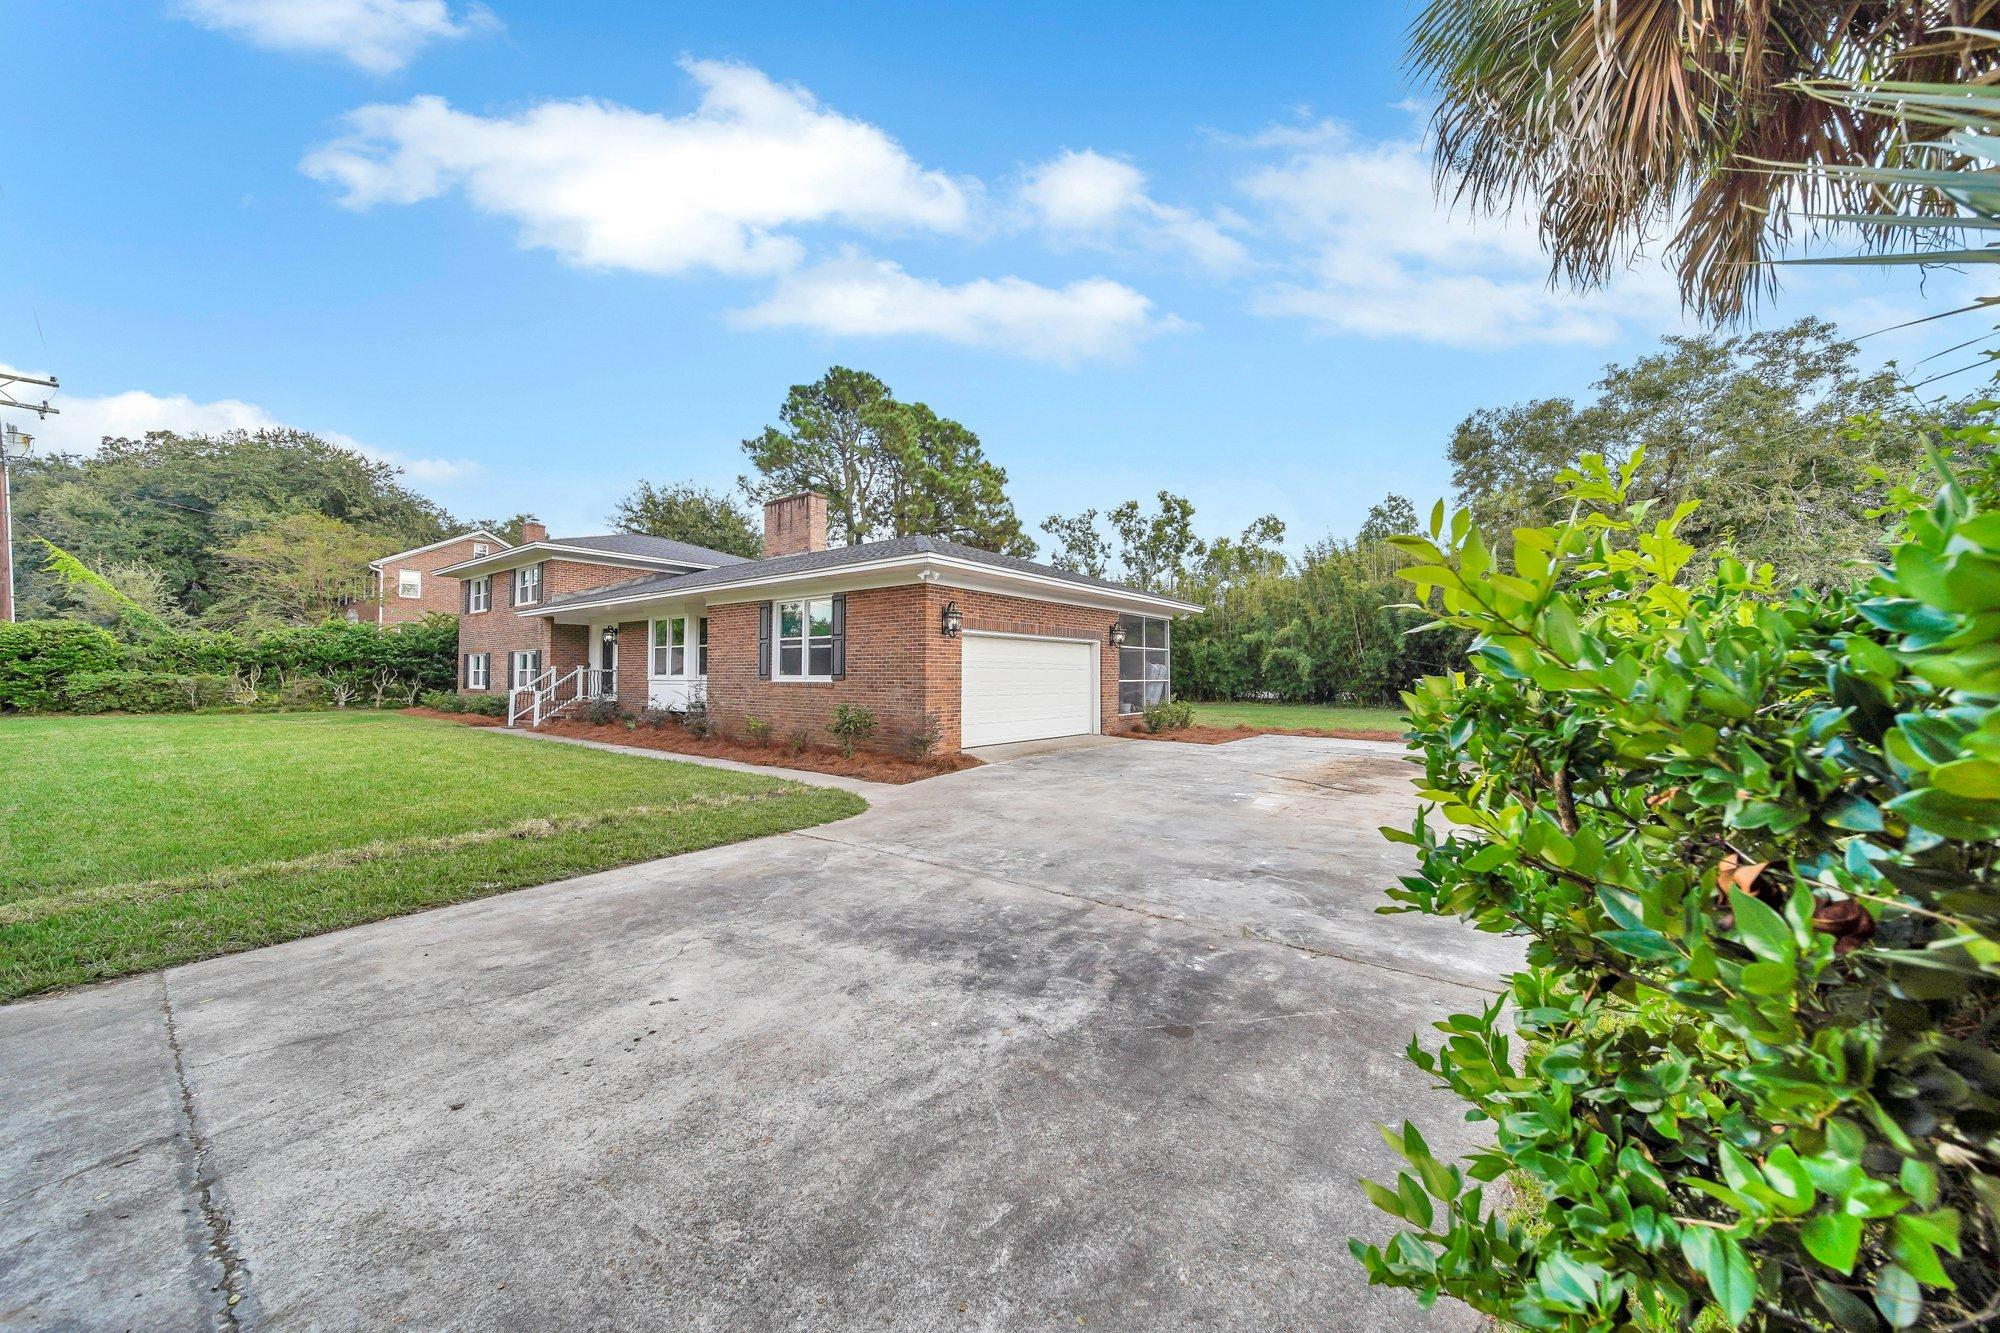 Country Club II Homes For Sale - 1477 Burningtree, Charleston, SC - 2